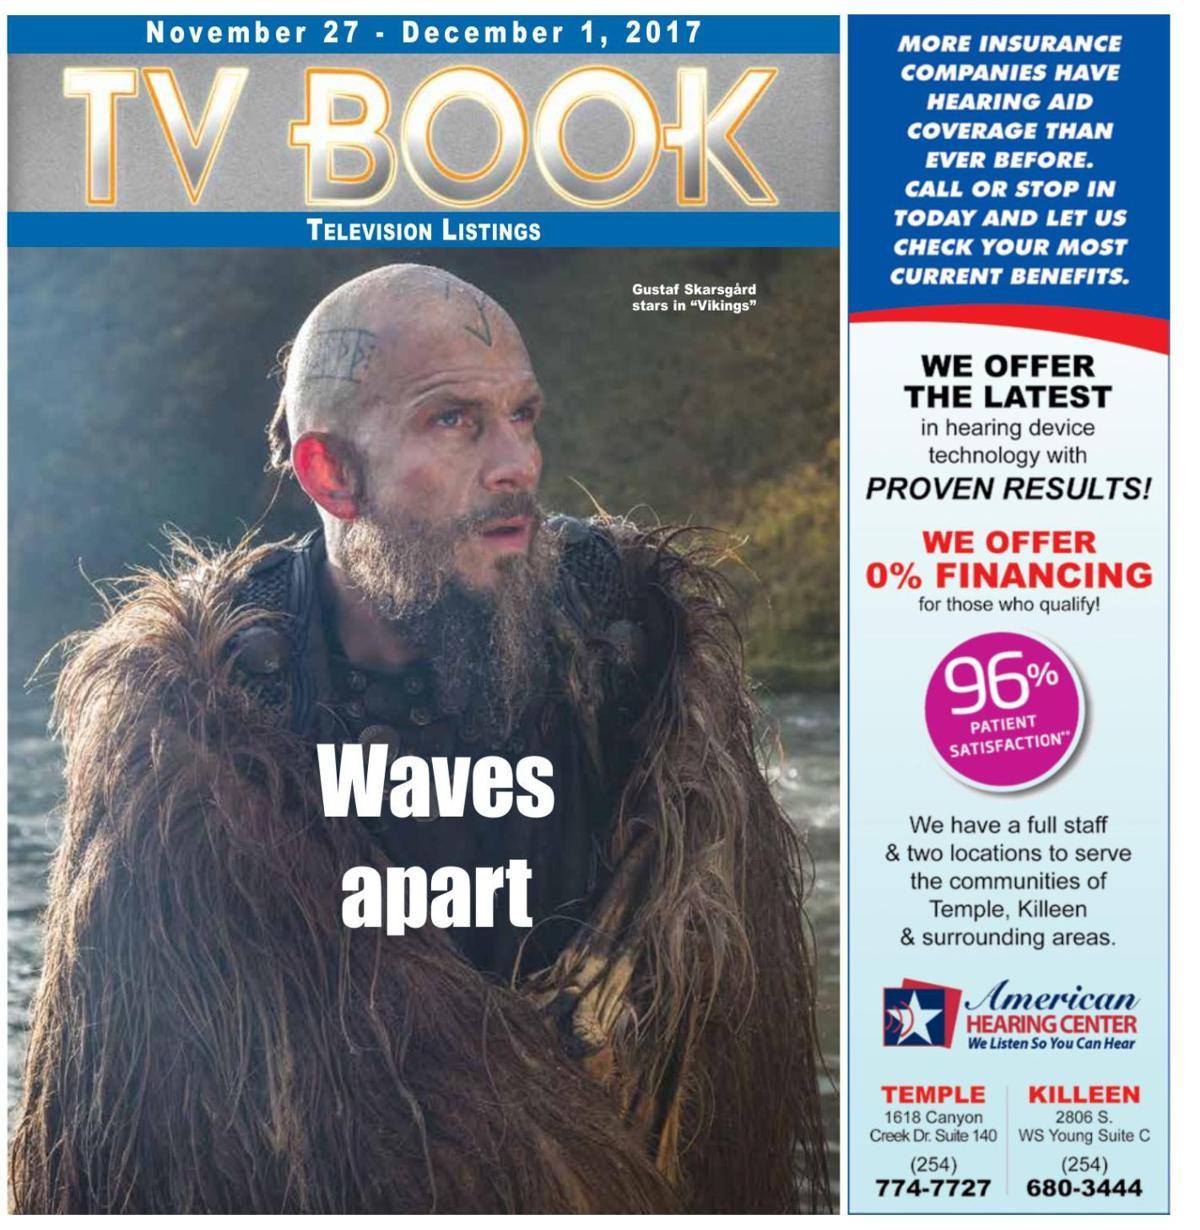 Tv Book Nov 26th - Dec 2nd